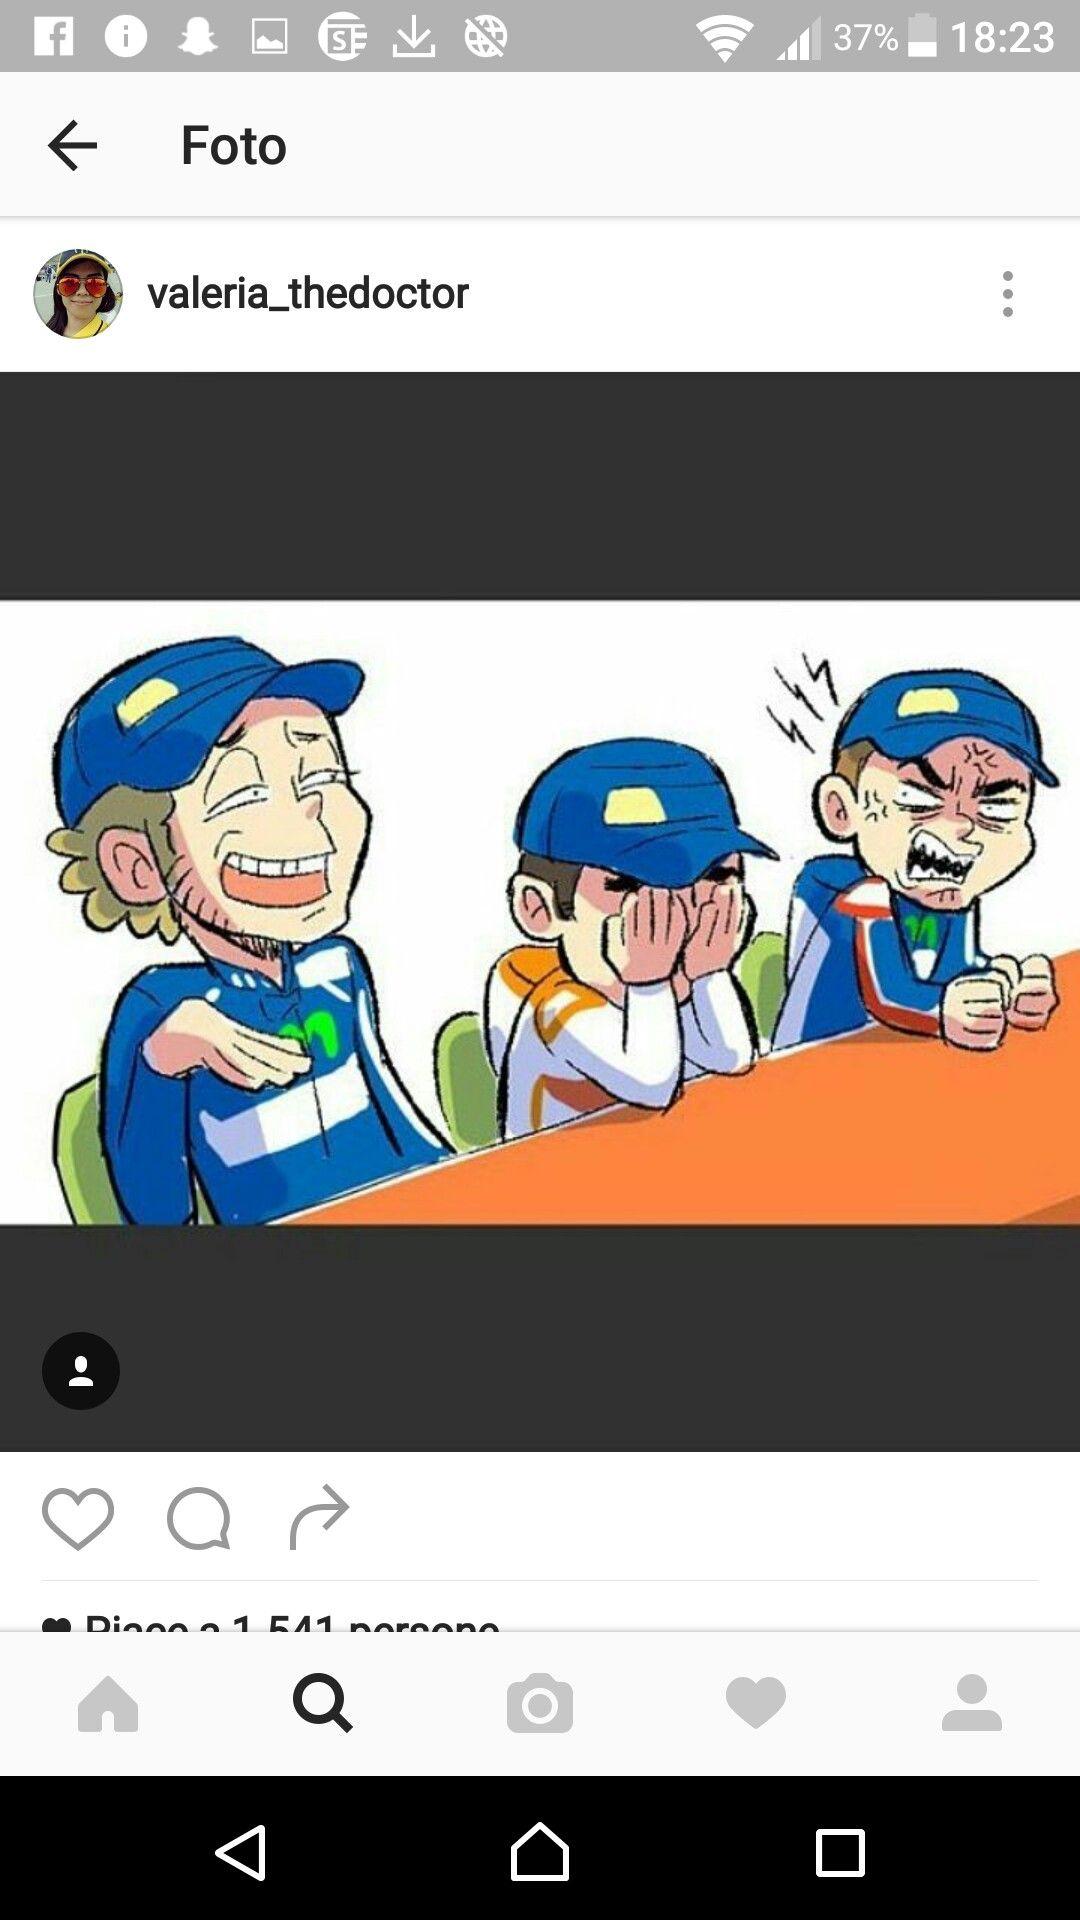 #Motogp #Funny #Meme